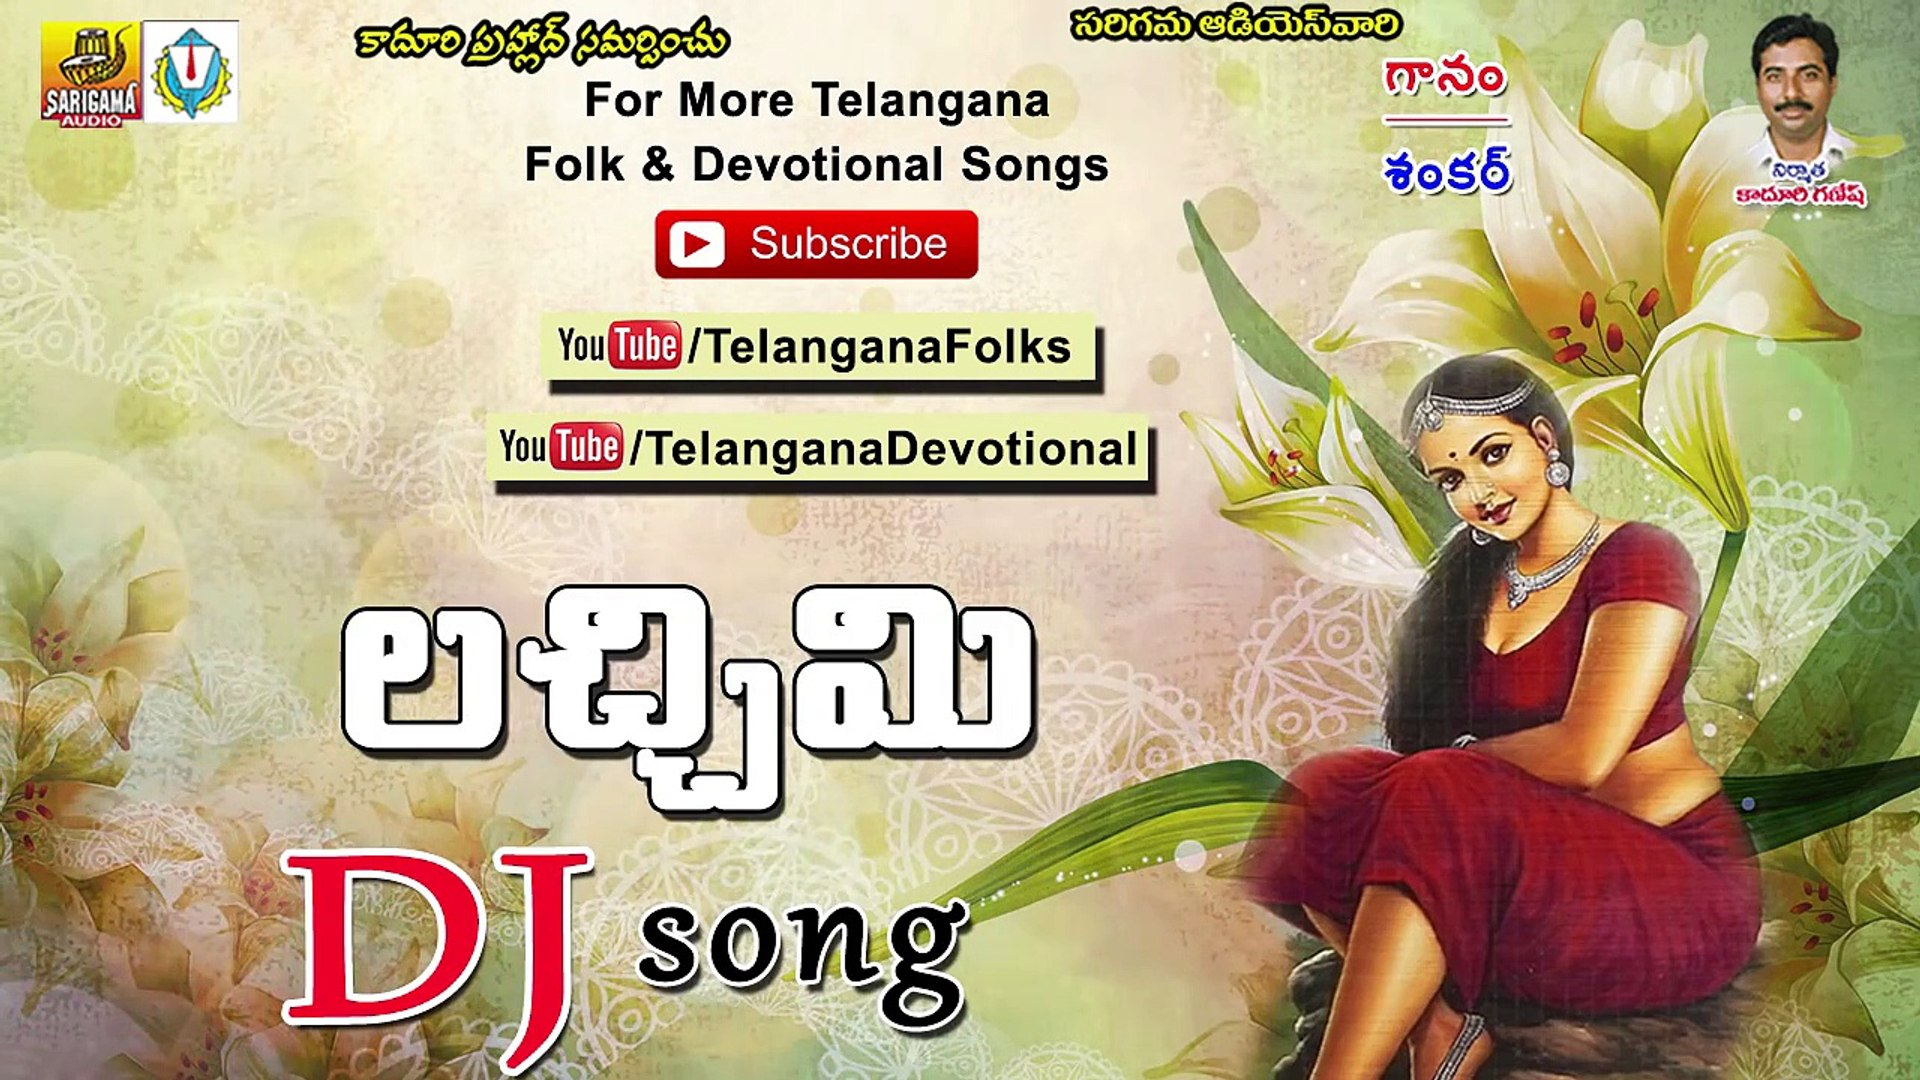 Lachimi Lachimi Dj Song - Dj Songs Telugu Folk Remix - Telangana Dj Songs -  Telugu Dj Songs 2015